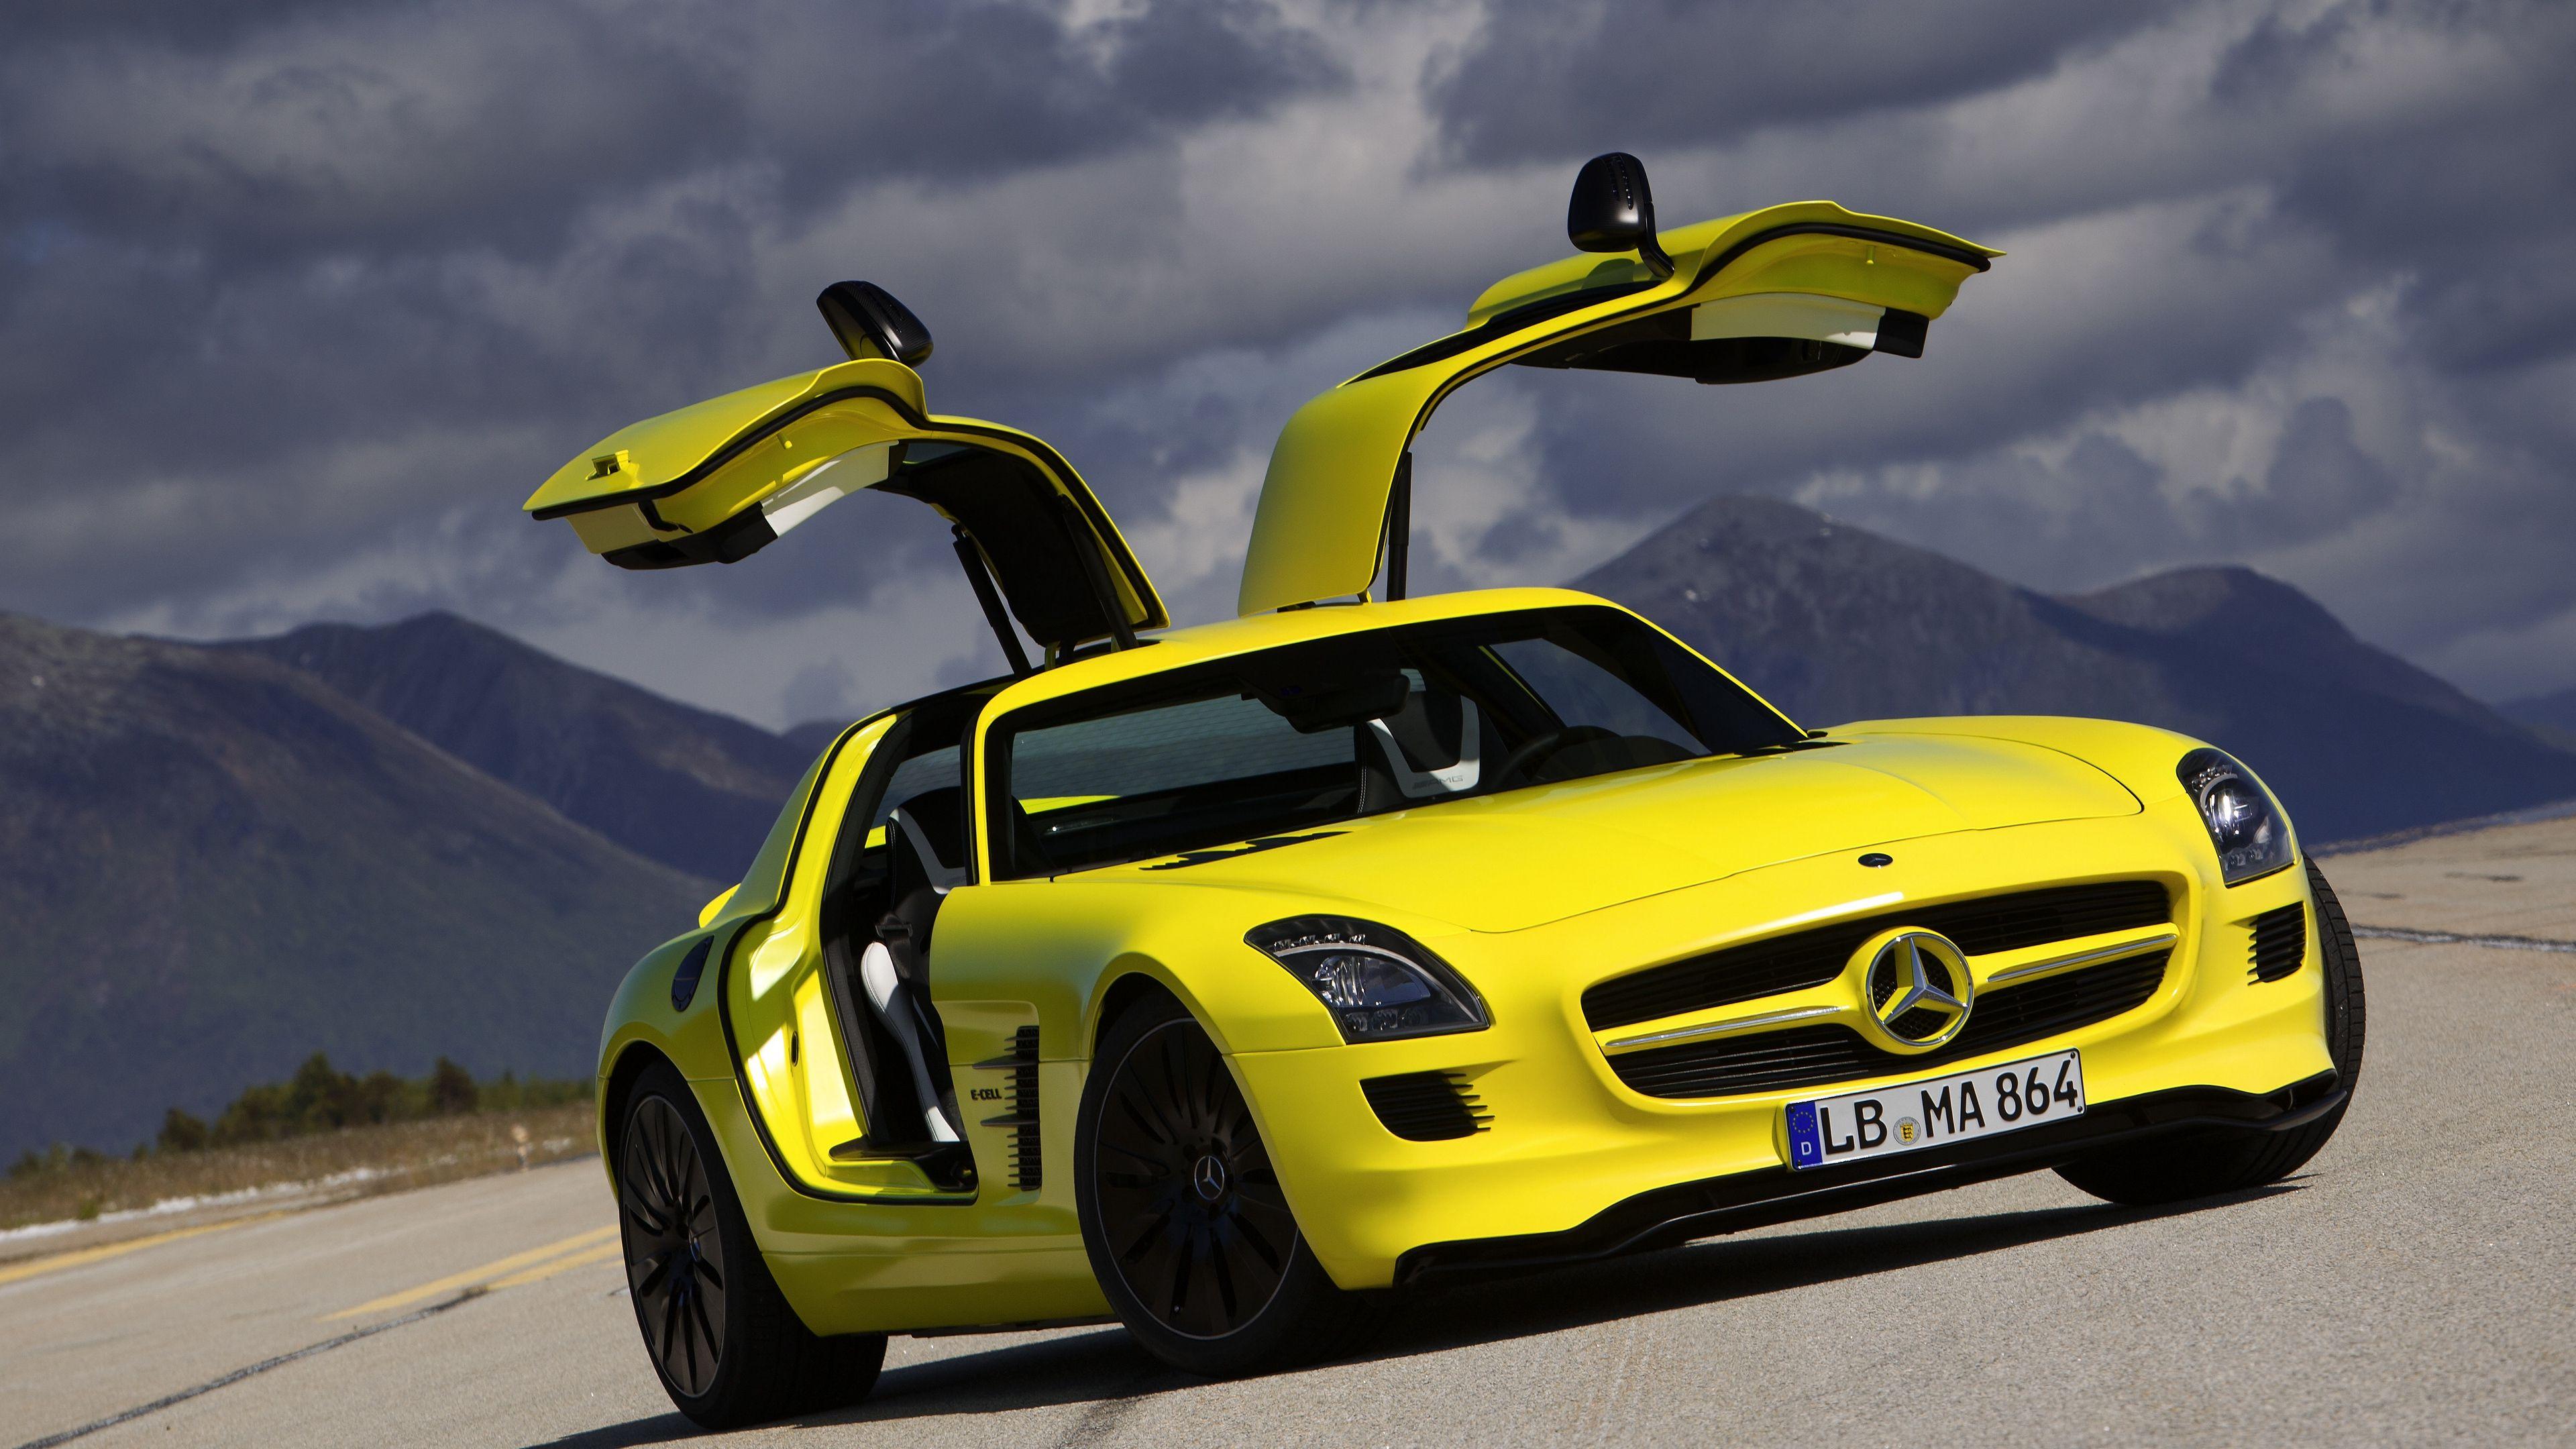 Wallpaper 4k Mercedes Benz Yellow Sls Amg E Cell Coupe 4k